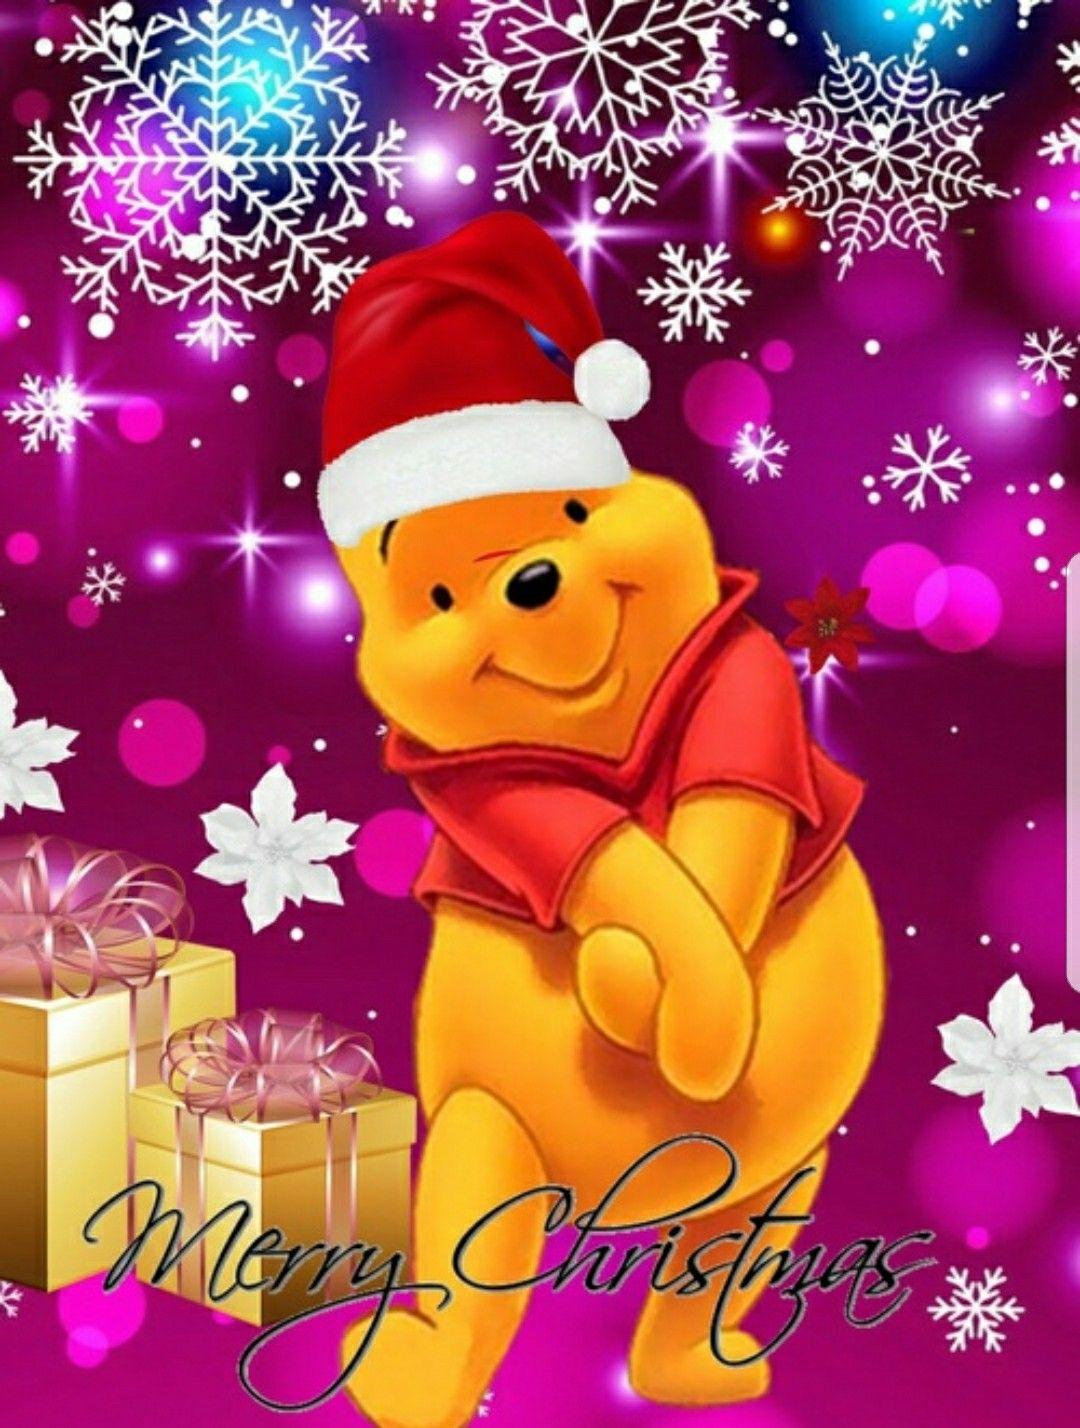 Pooh bear | Pooh quotes | Pinterest | Cumple, Para el hogar y Ideas para